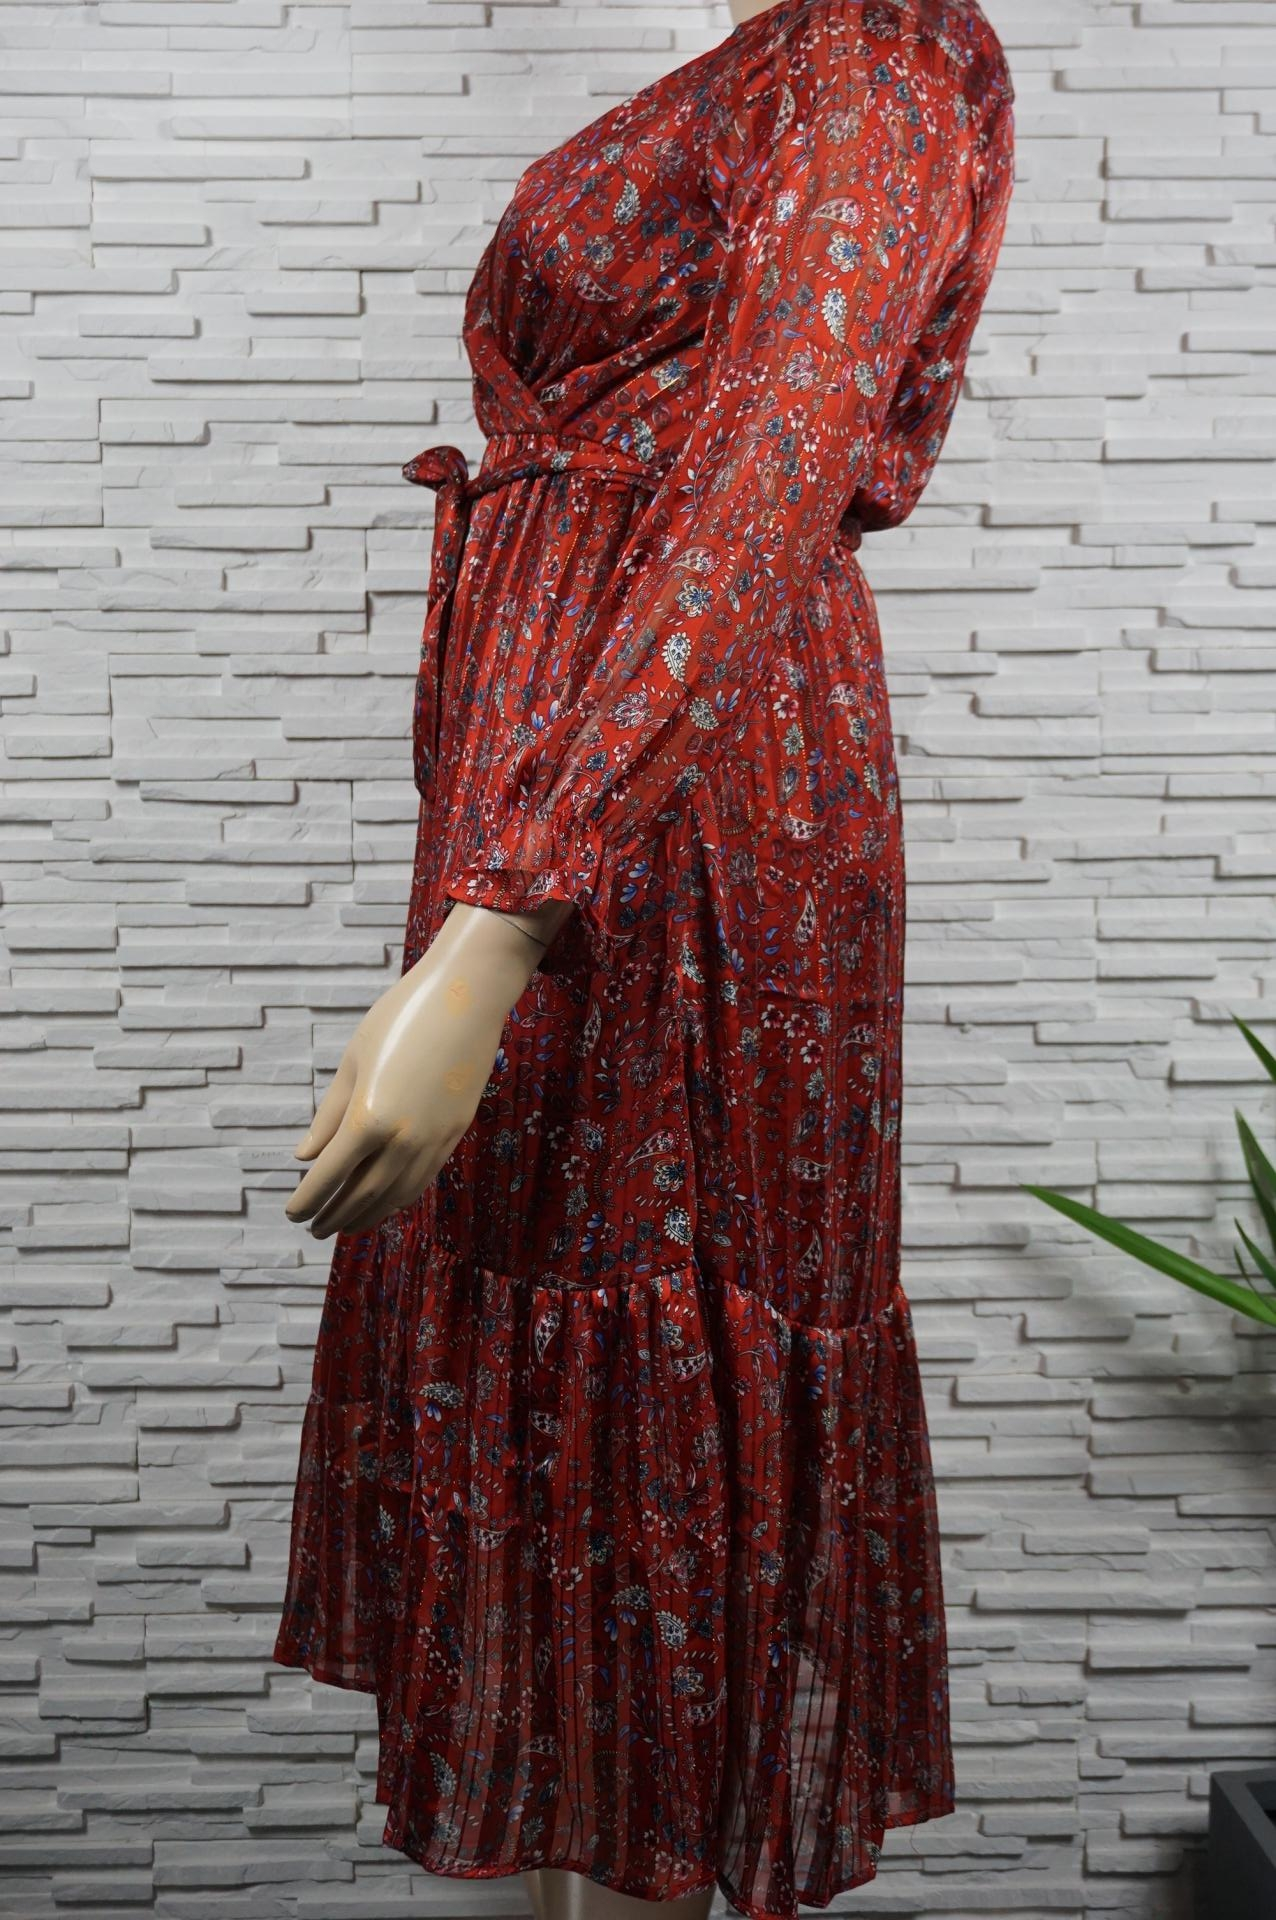 Robe longue fleurie or.